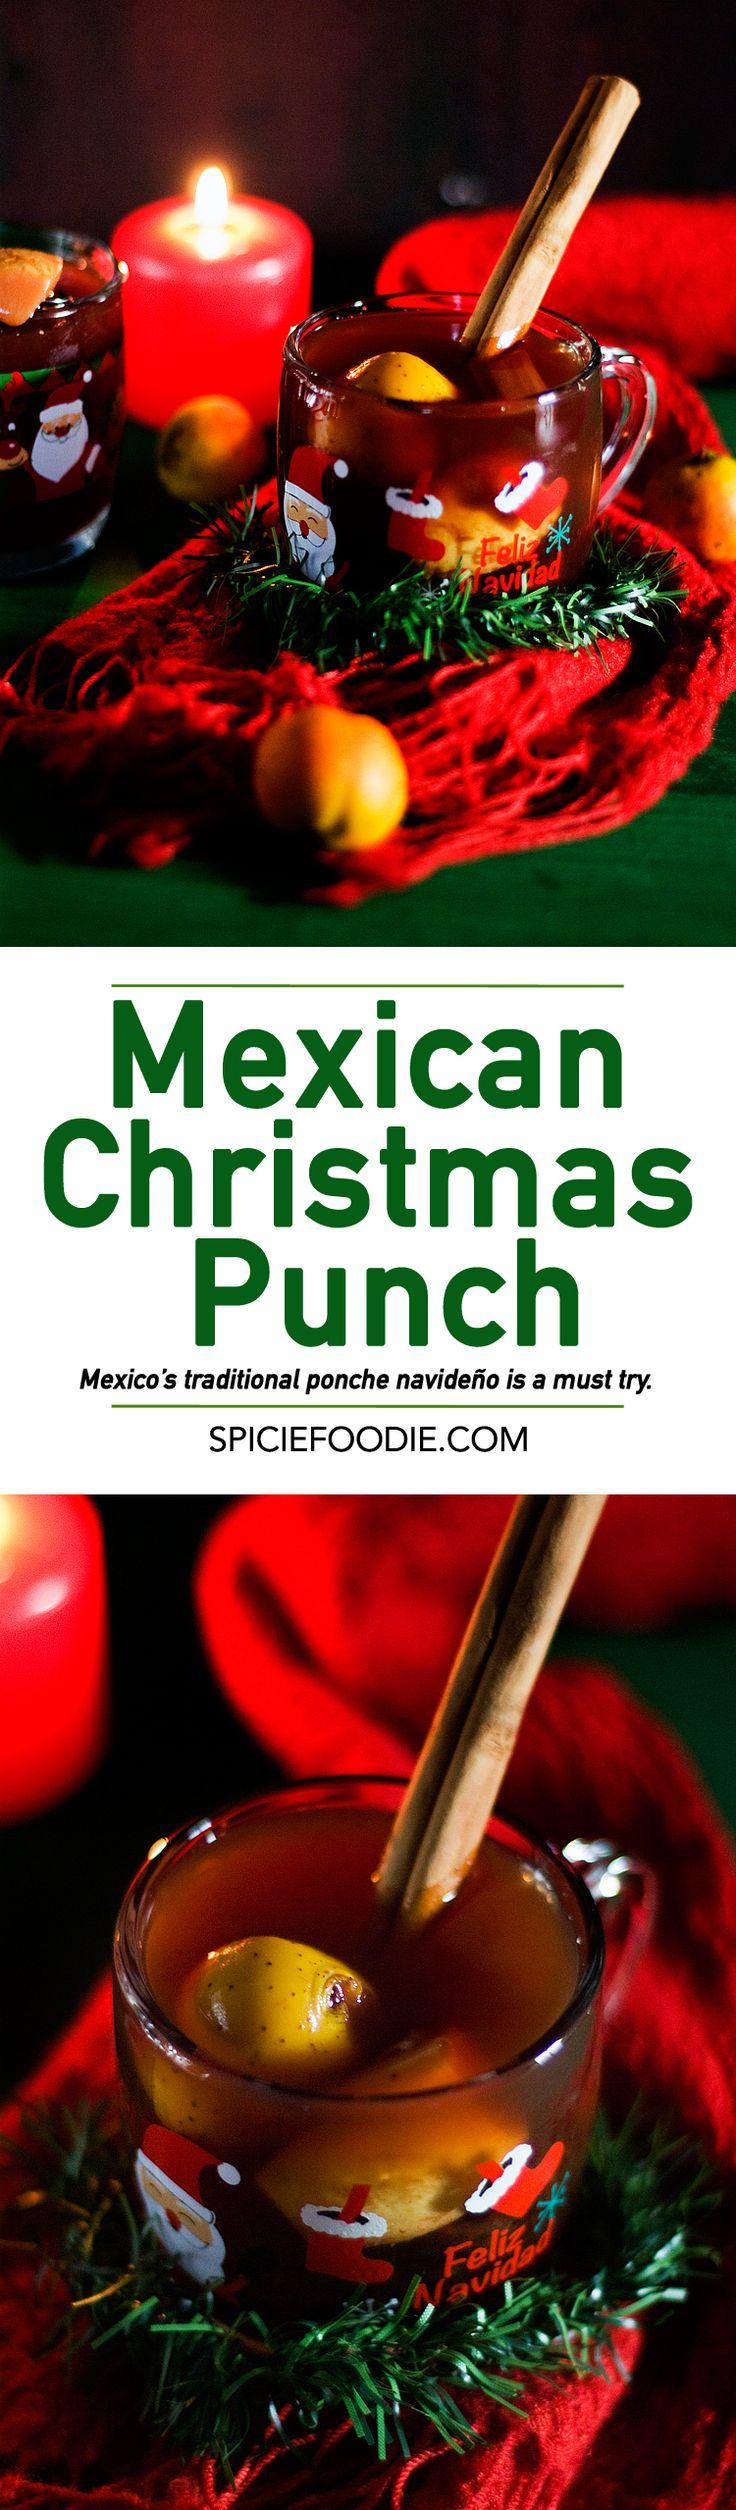 Mexican Christmas Punch or Ponche Navideño  | #vegan #tejocotes #ponche